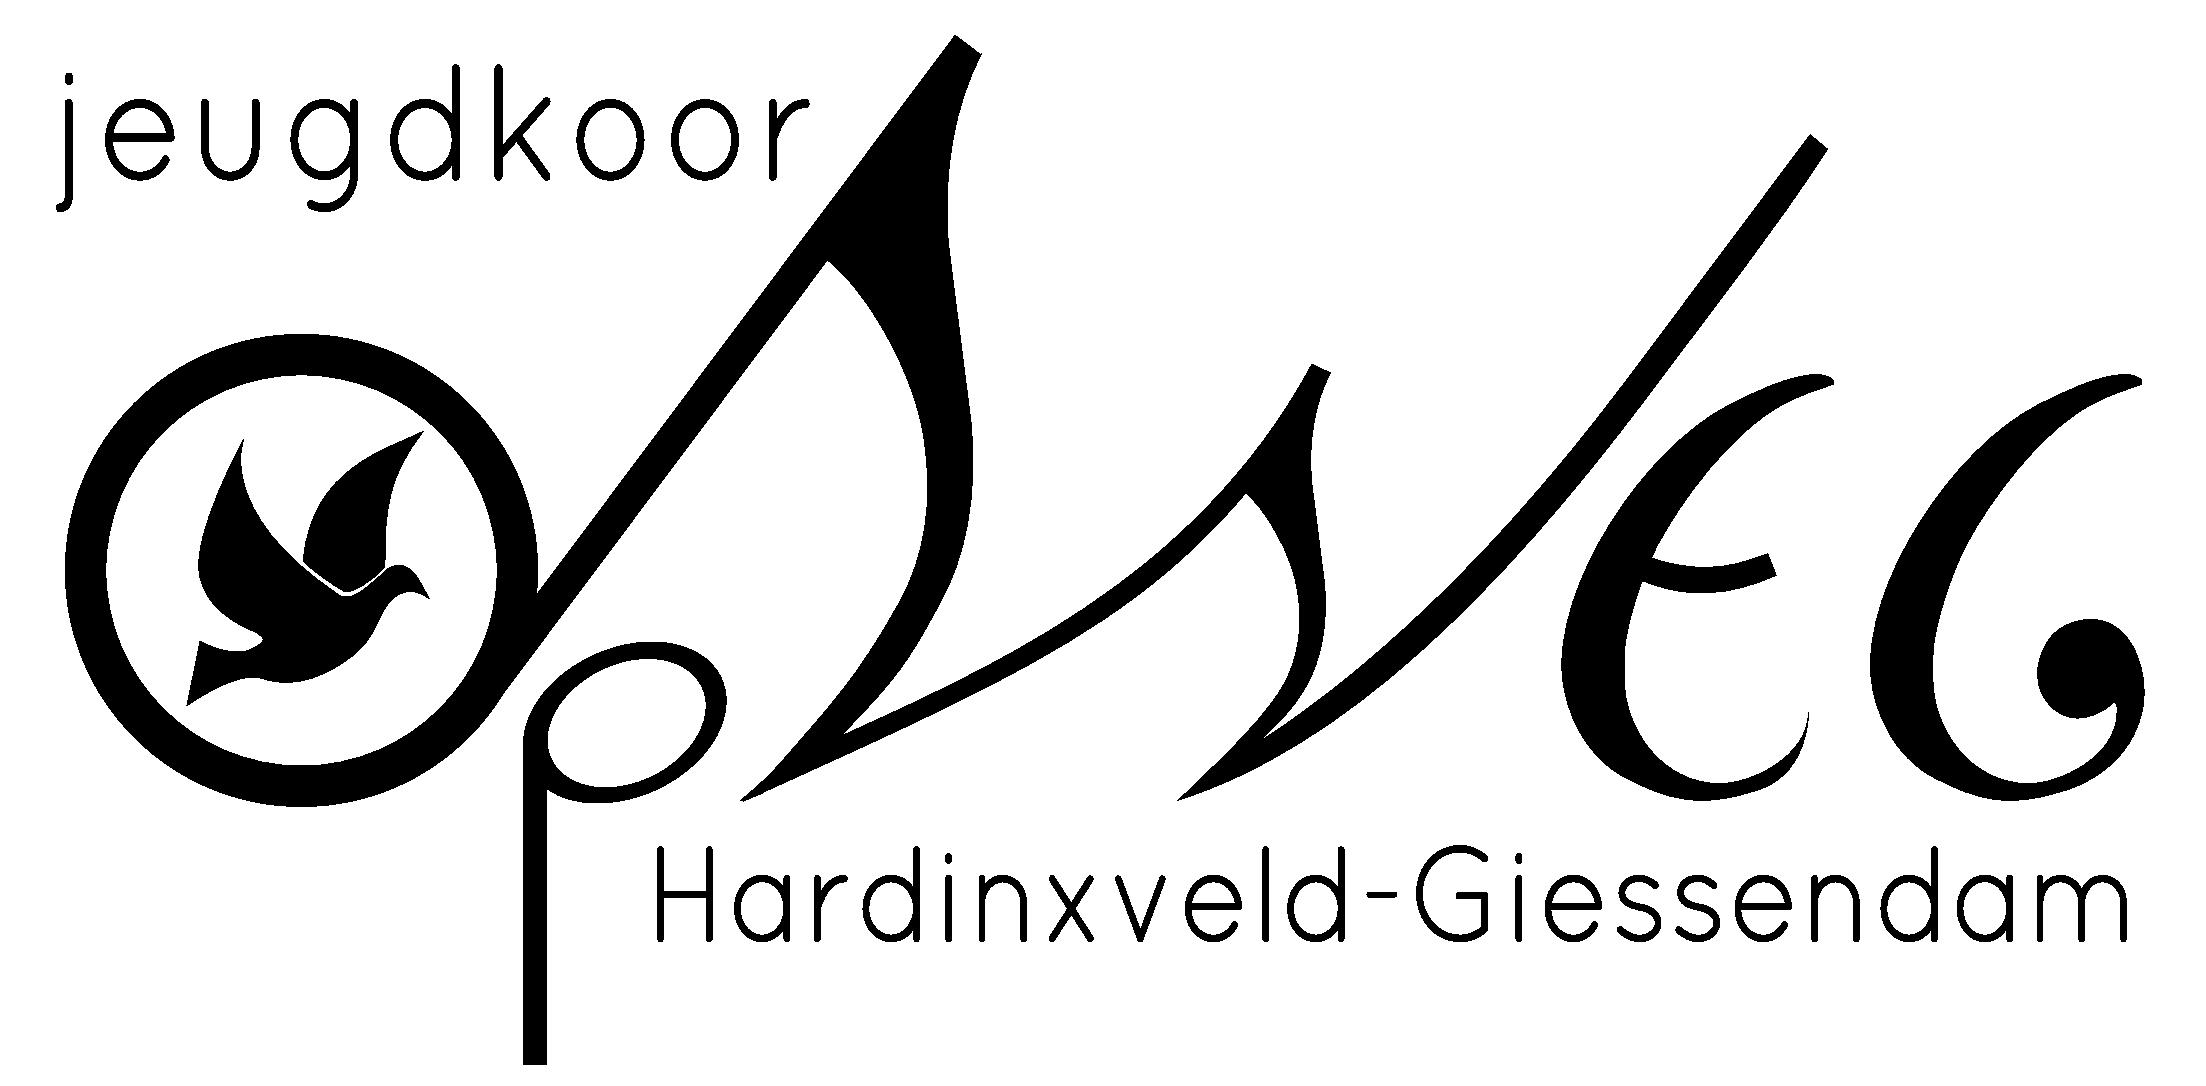 Jeugdkoor-Op-Weg-logo-zwart